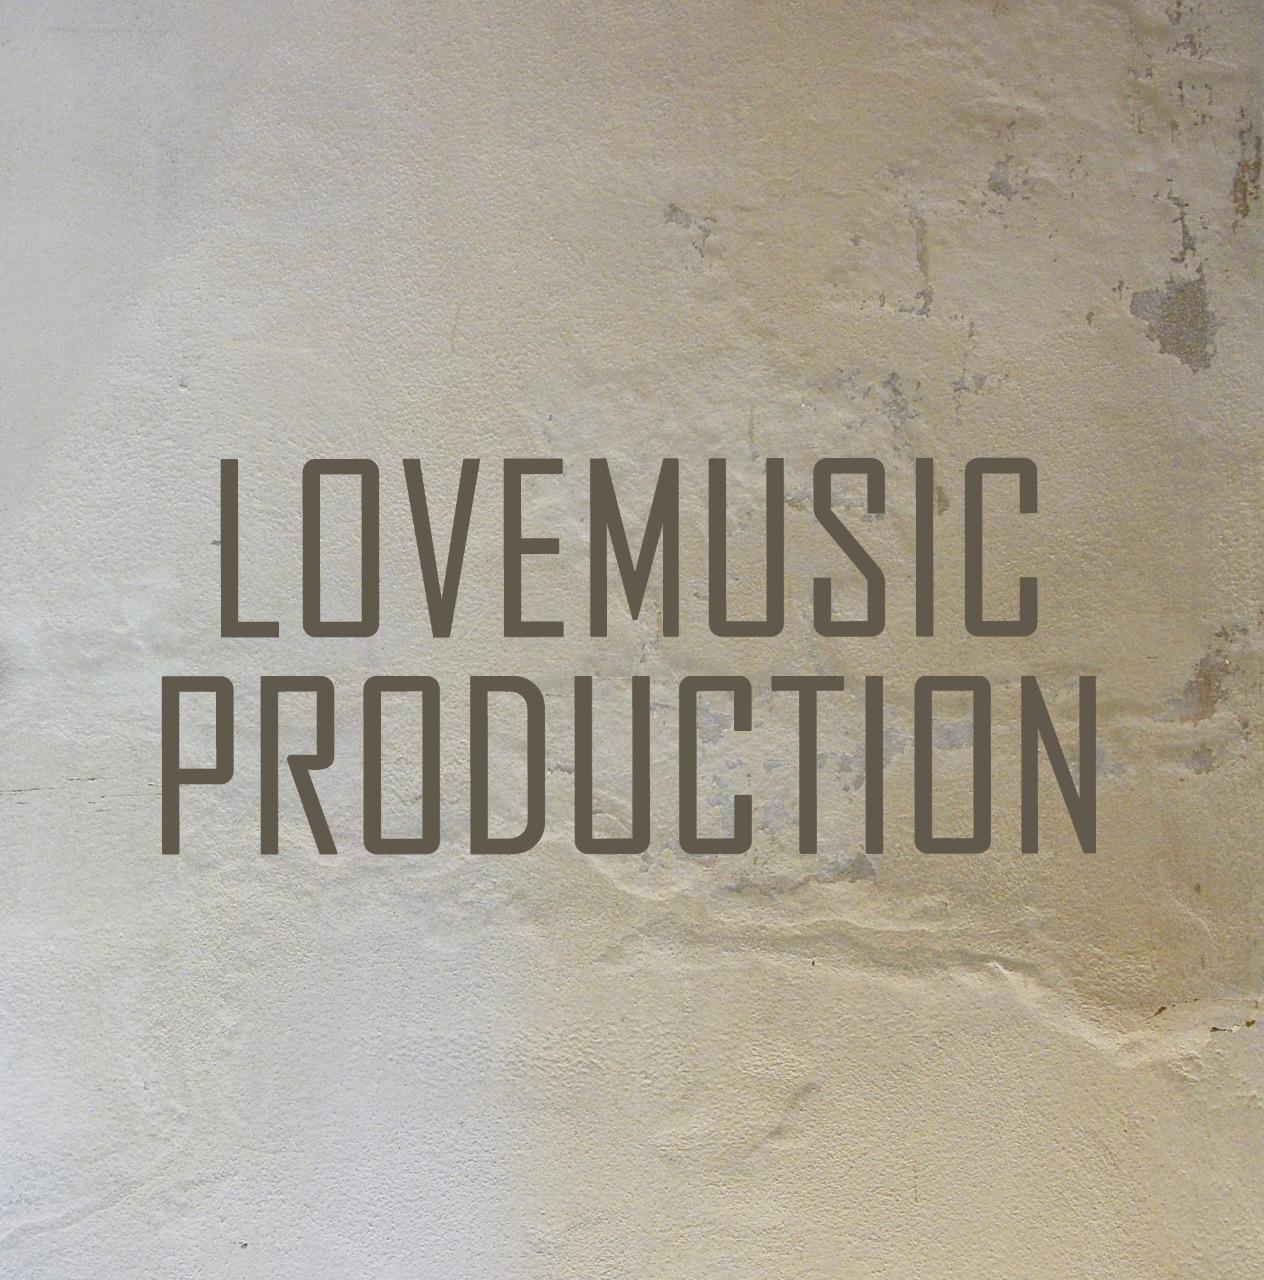 Lovemusic Production